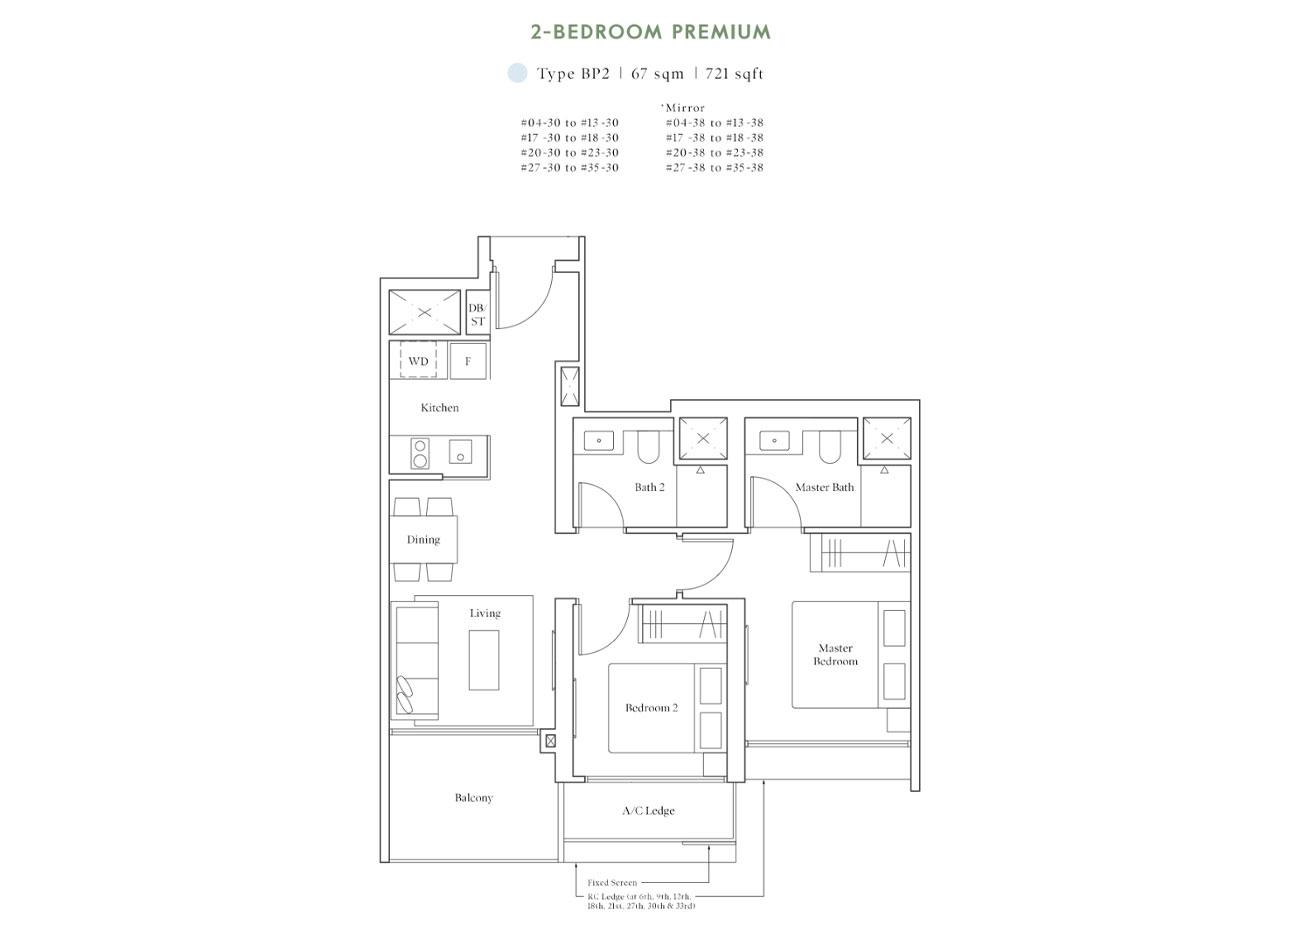 Horizon Collection - 2 Bedroom Premium, BP2